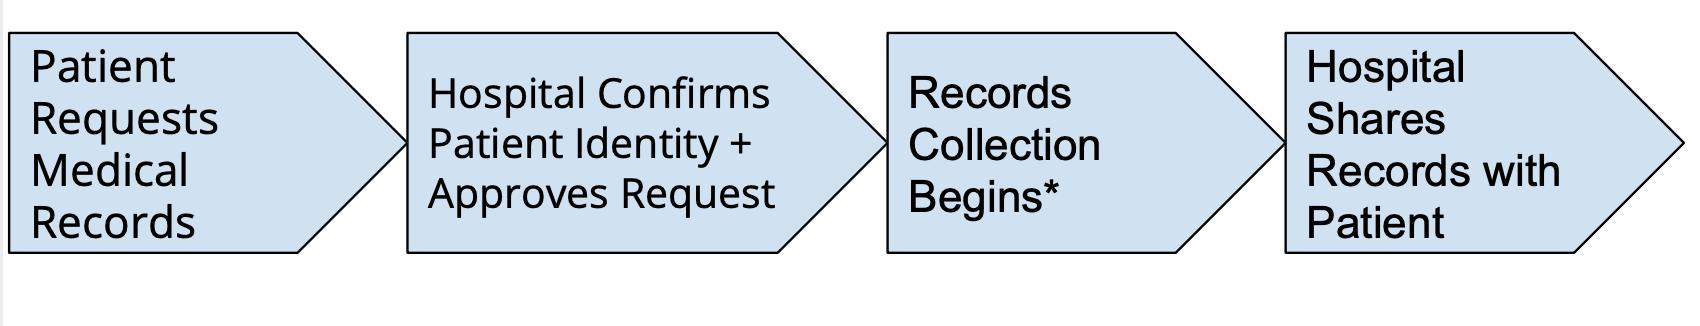 patient record request process